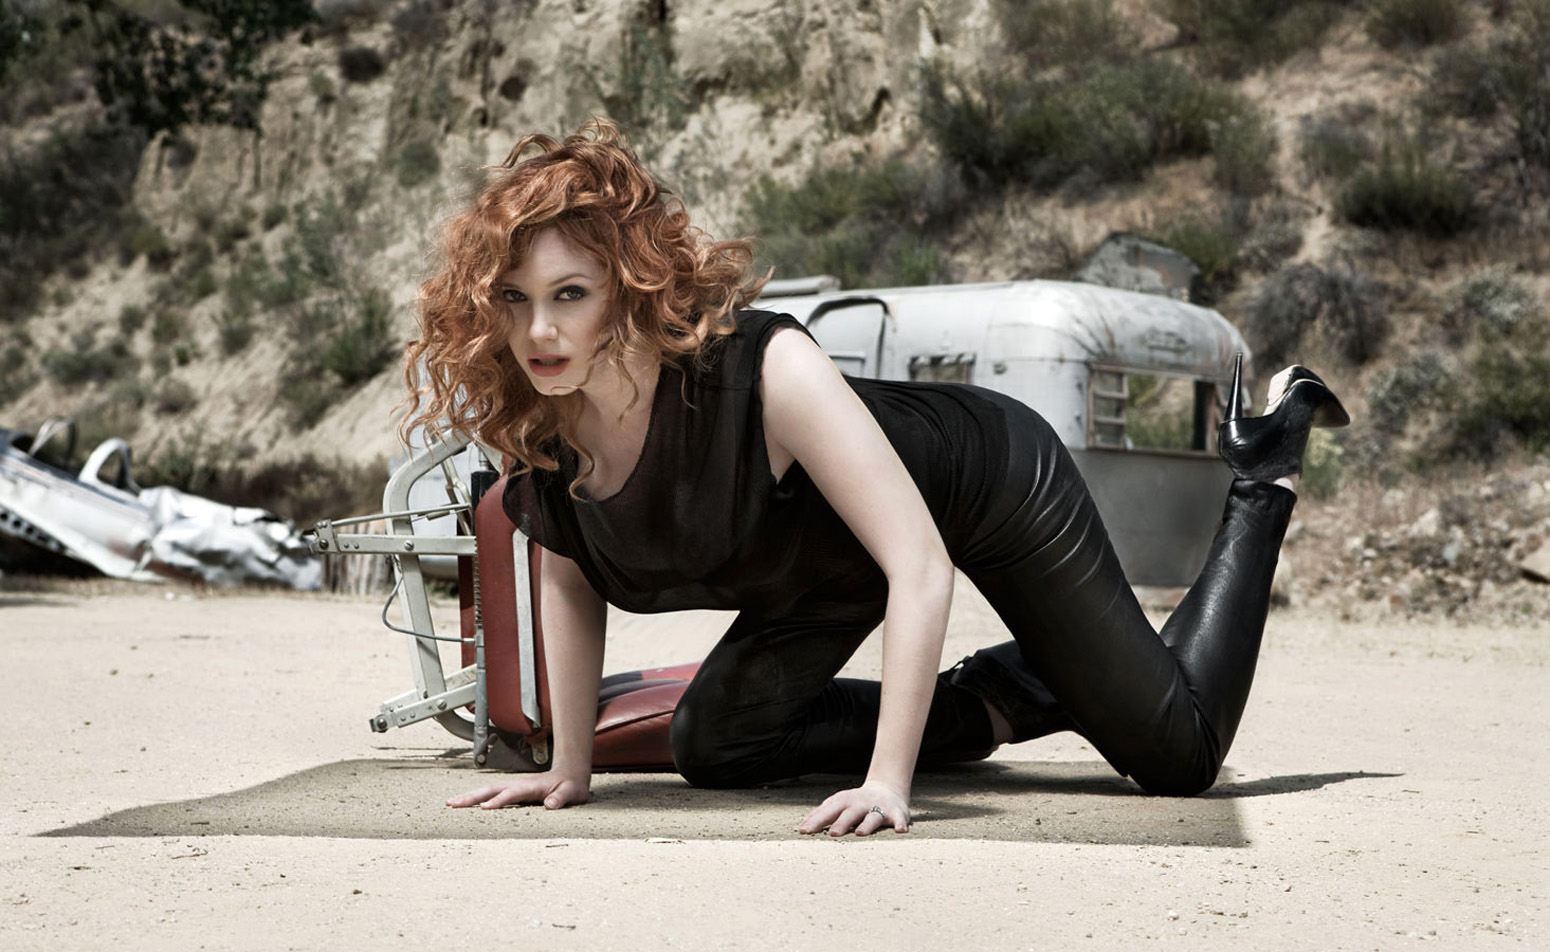 christina-hendricks-sexy-pictures